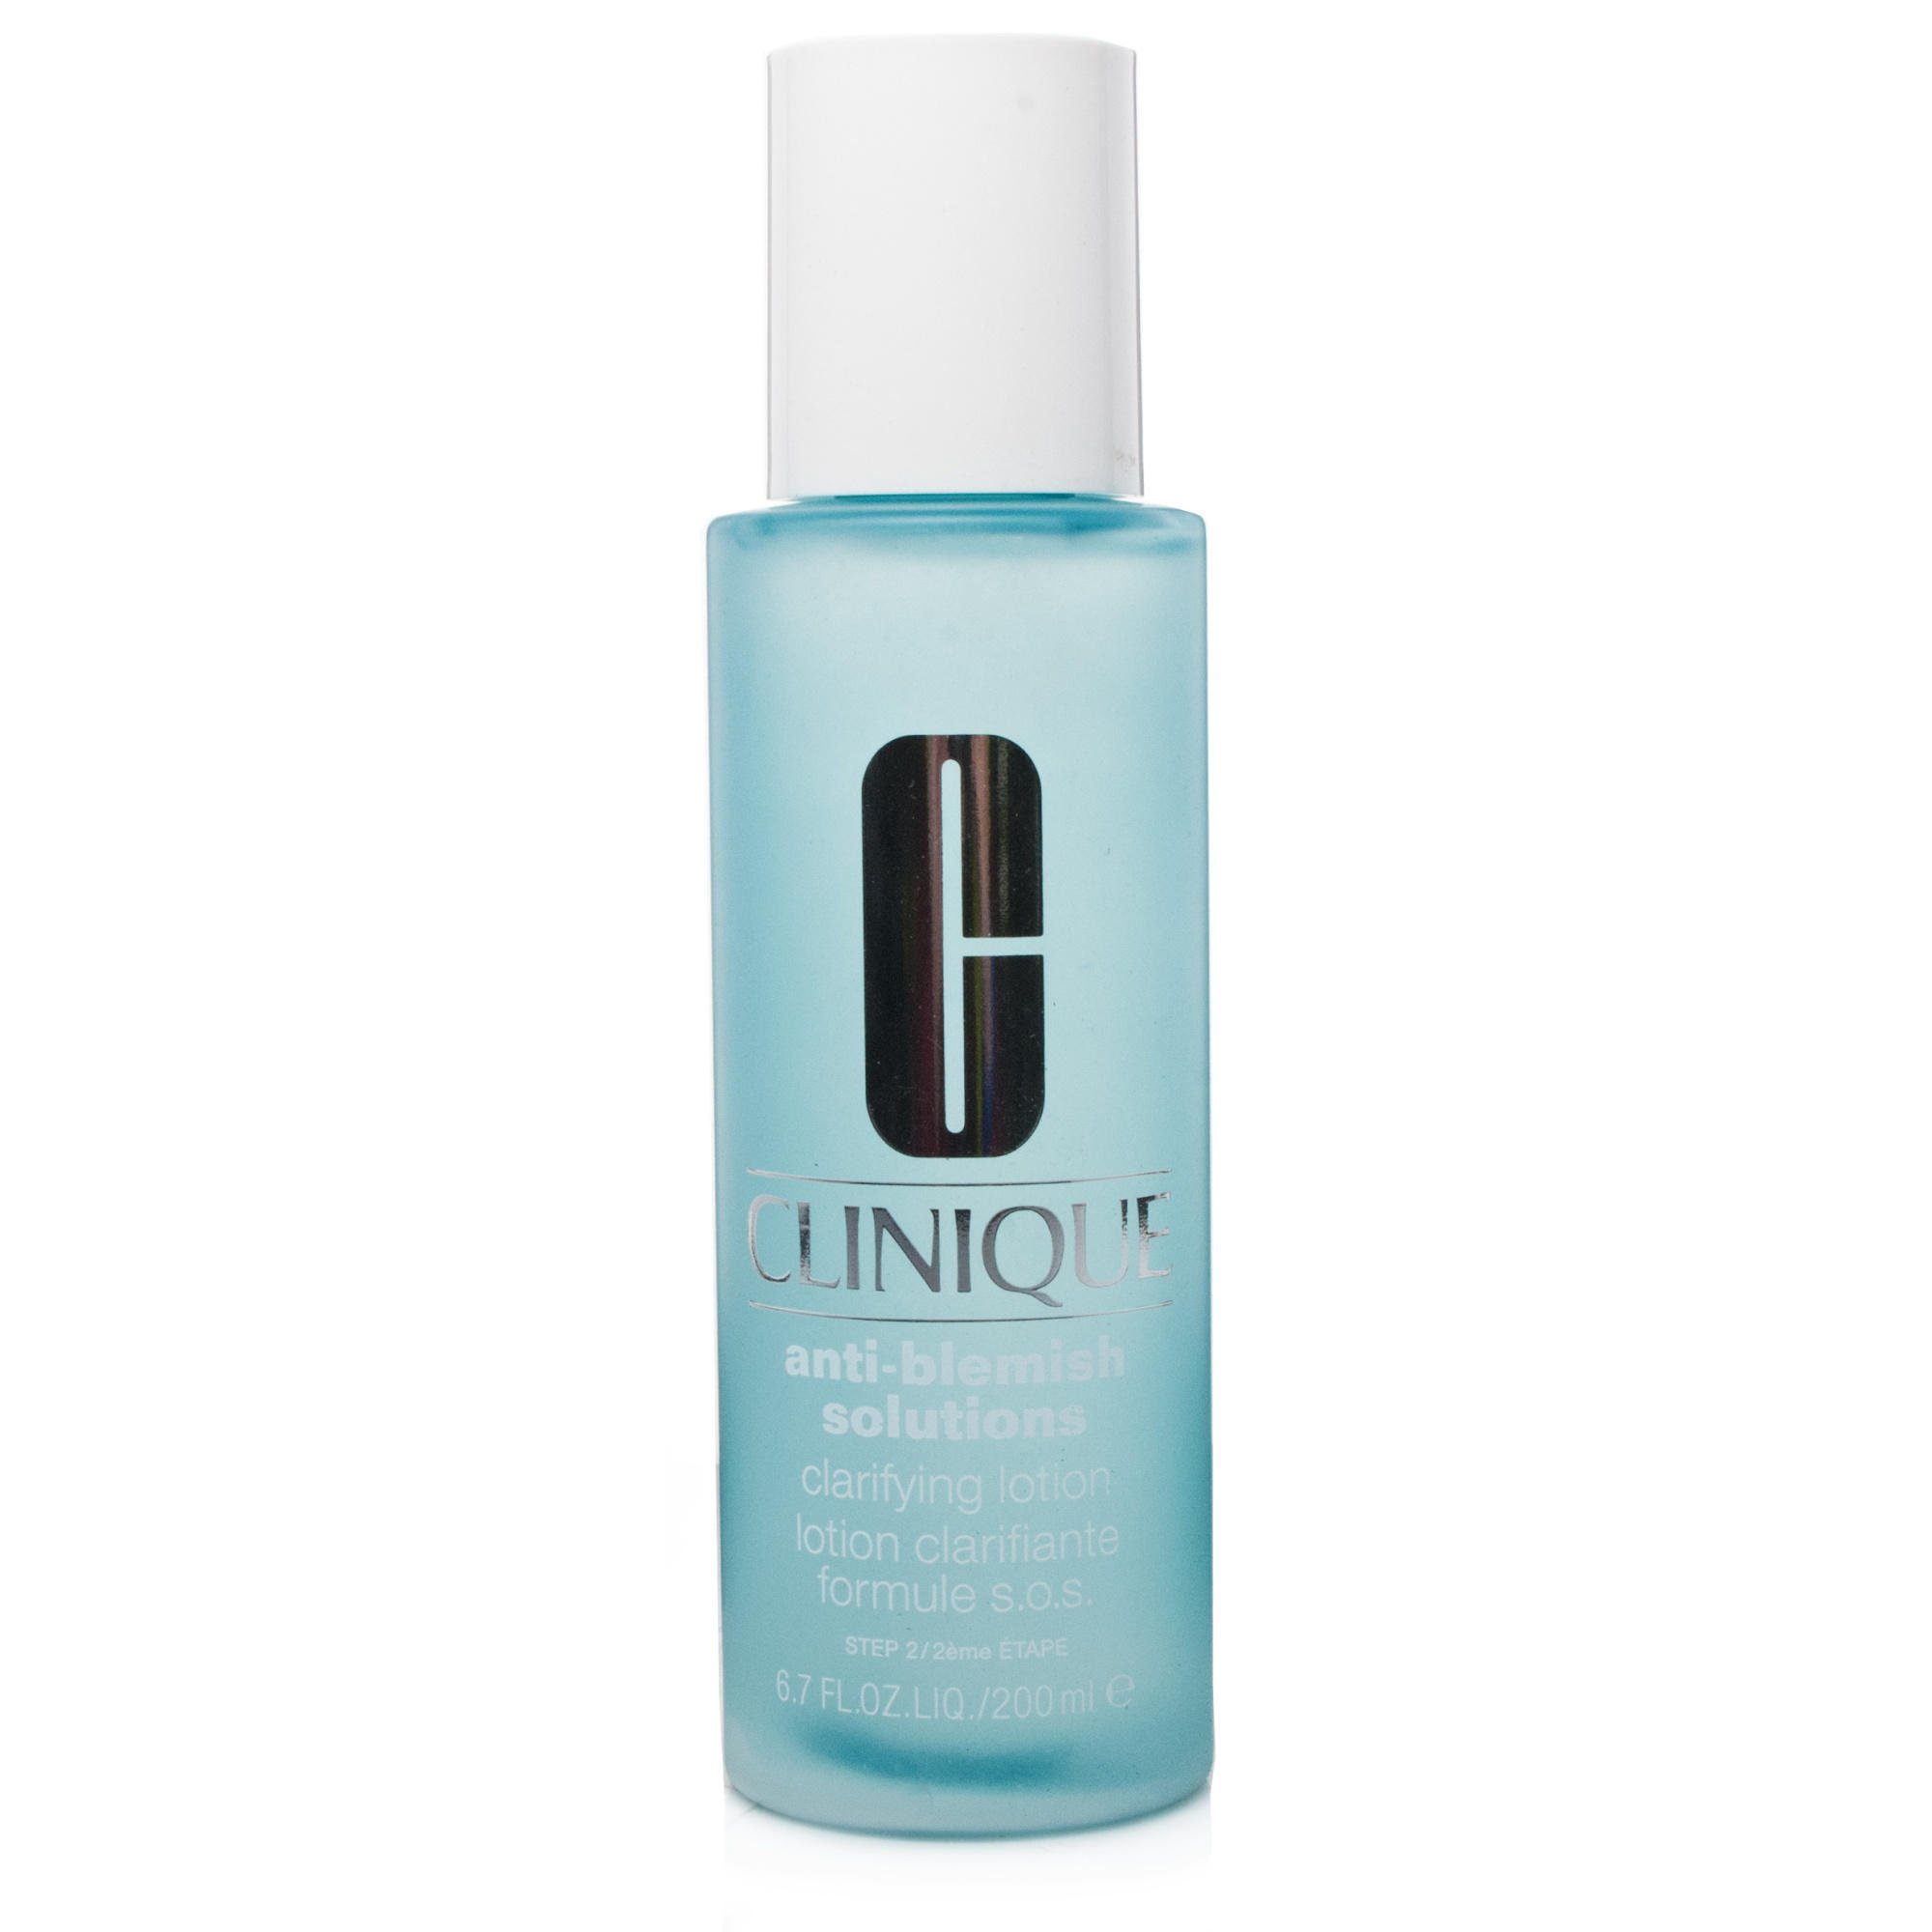 Clinique - Anti-Blemish clarifying lotion 200 ml. /Skin Care